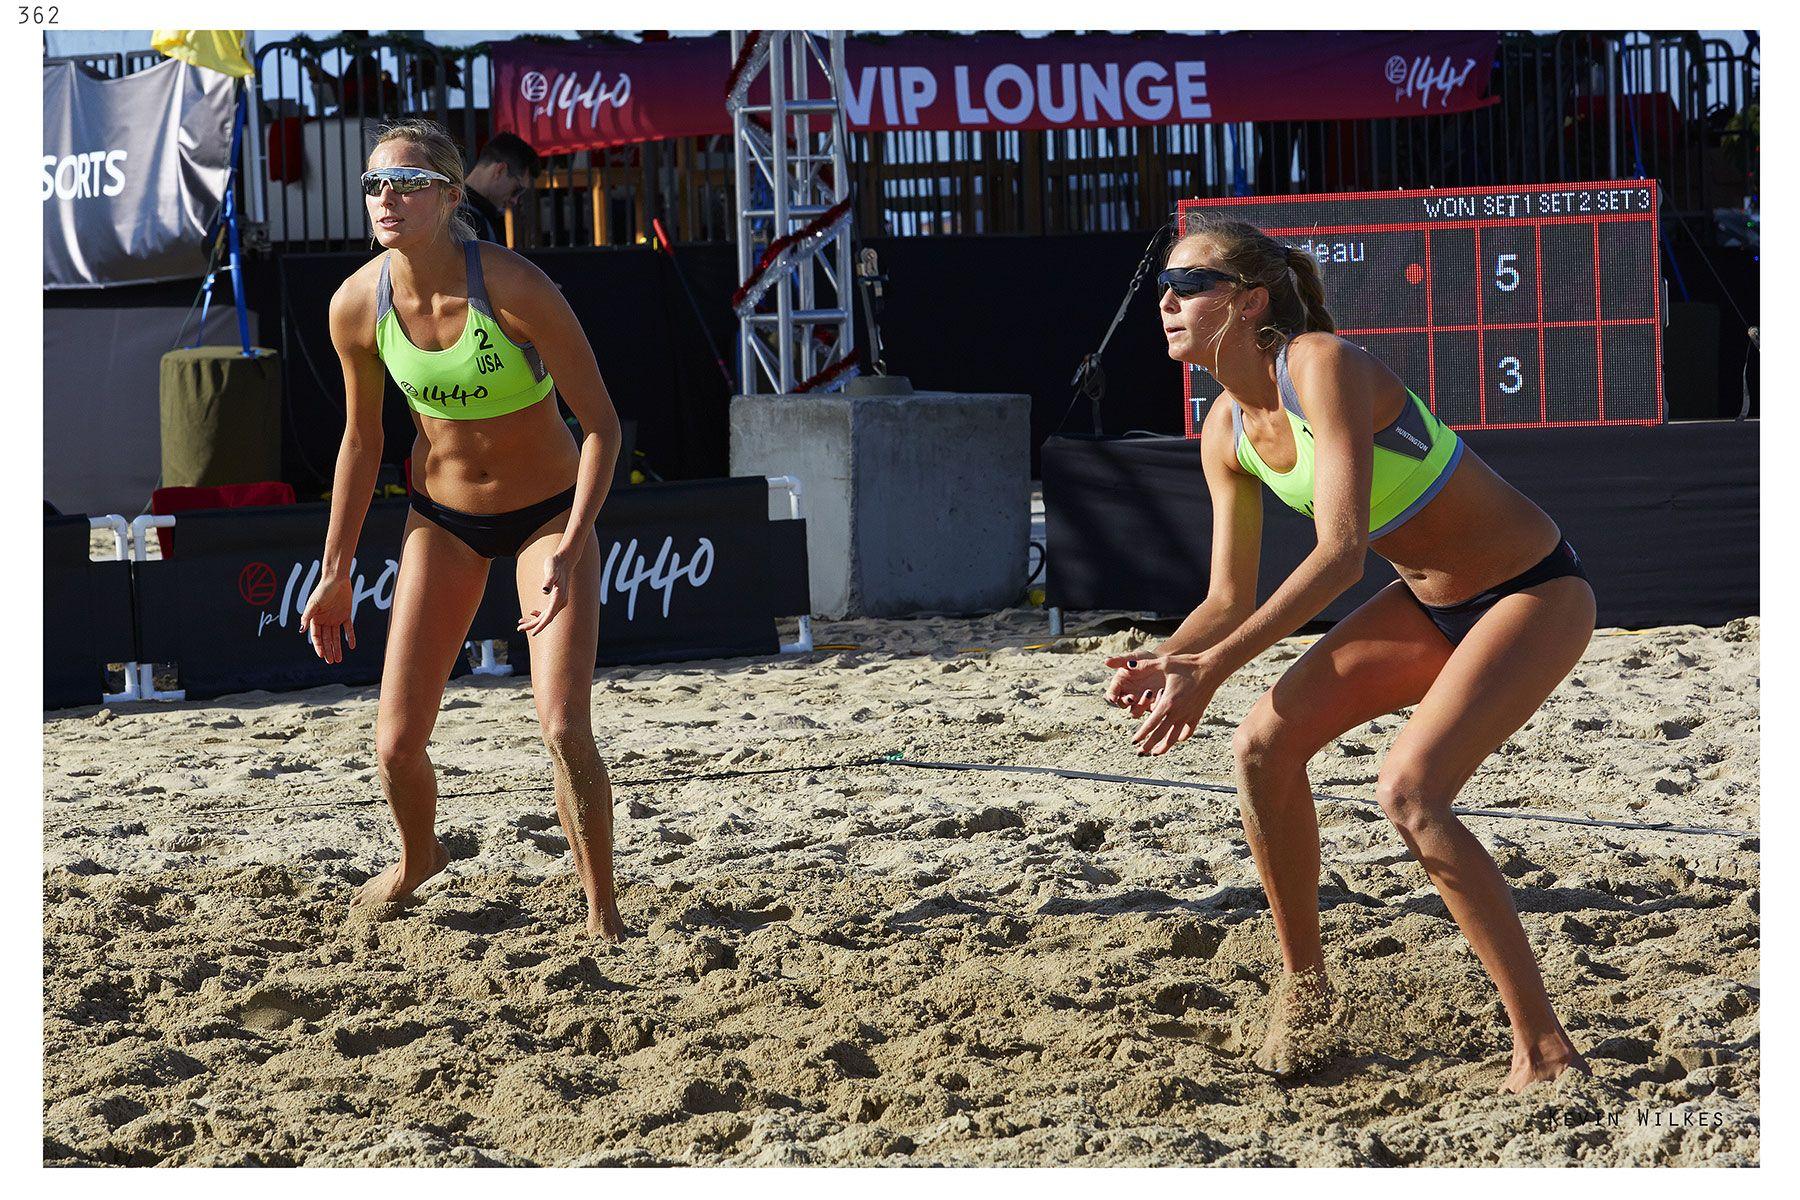 Madison and McKenna at Huntington Beach p1440 tournament.